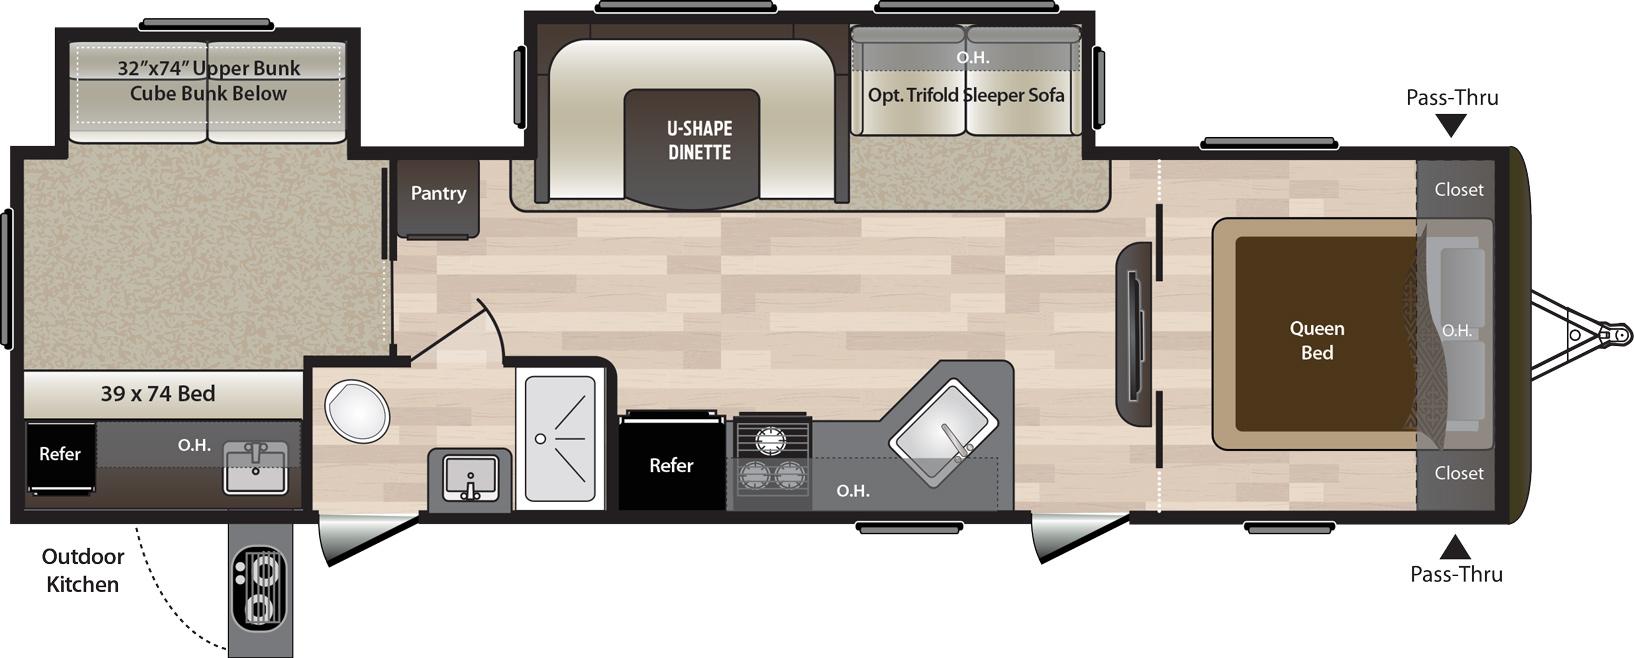 2019 KEYSTONE HIDEOUT 31RBDS (bunks) Floorplan